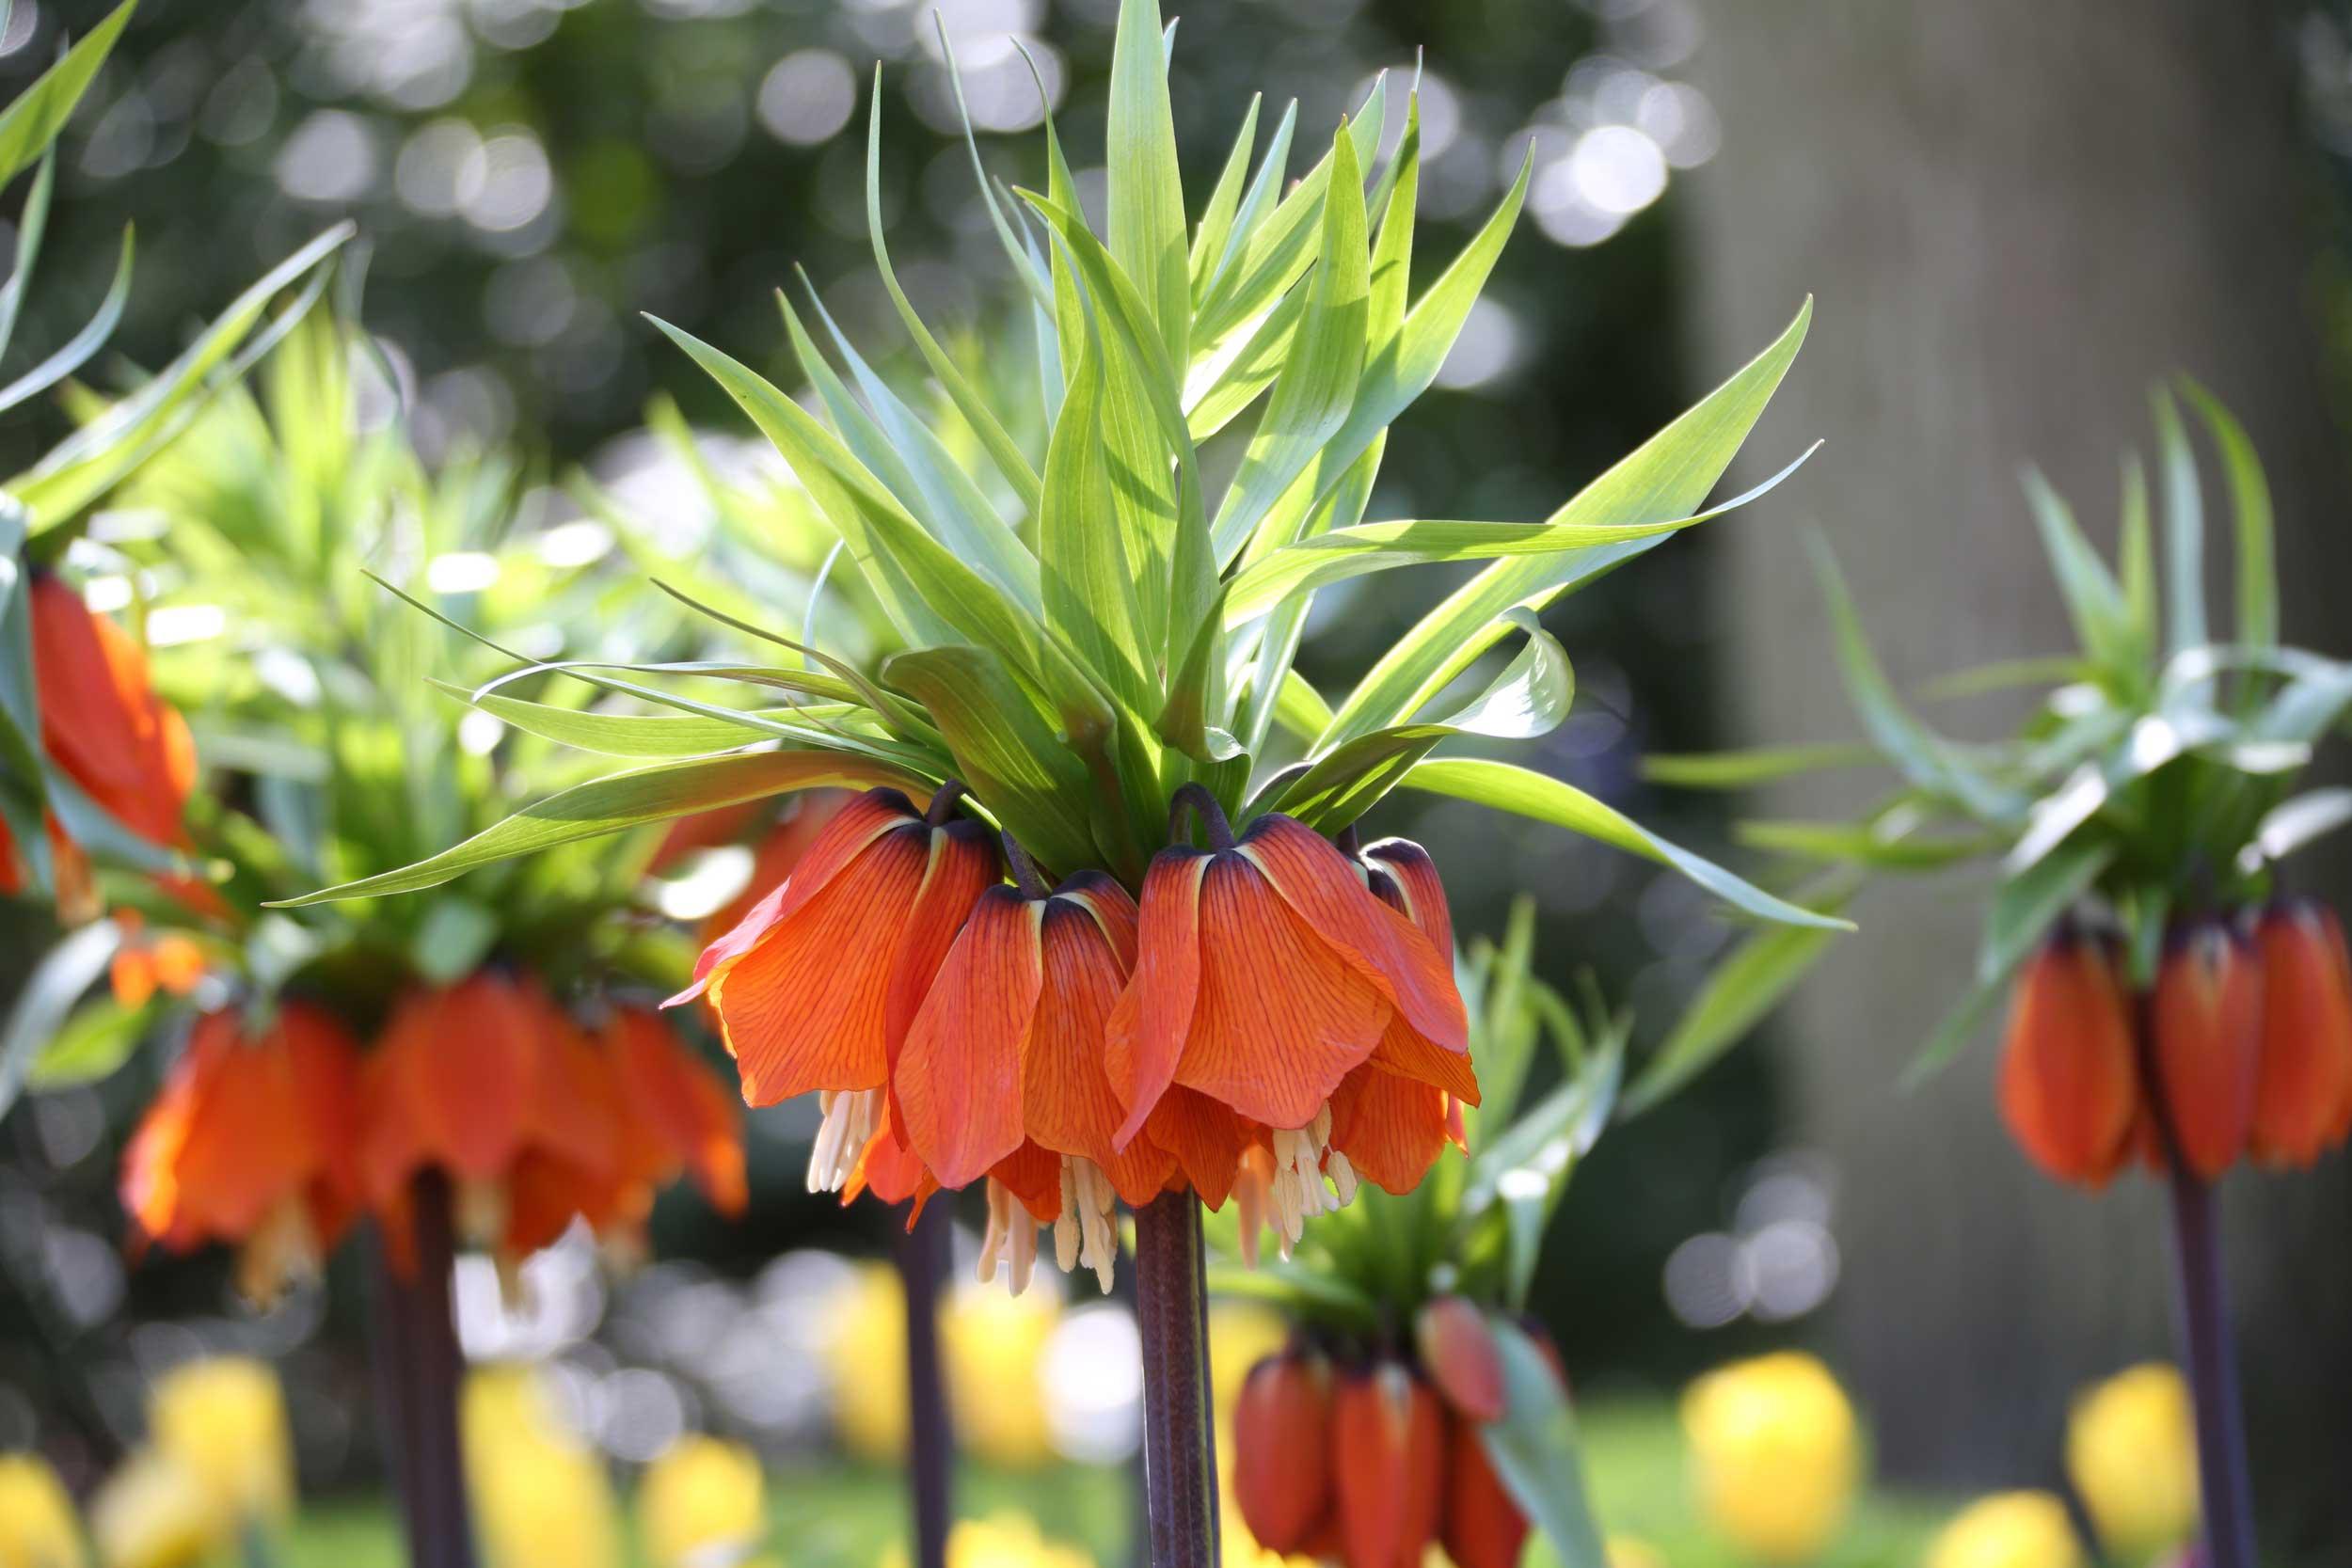 Fritillaria-imperialis-Longfield Gardens